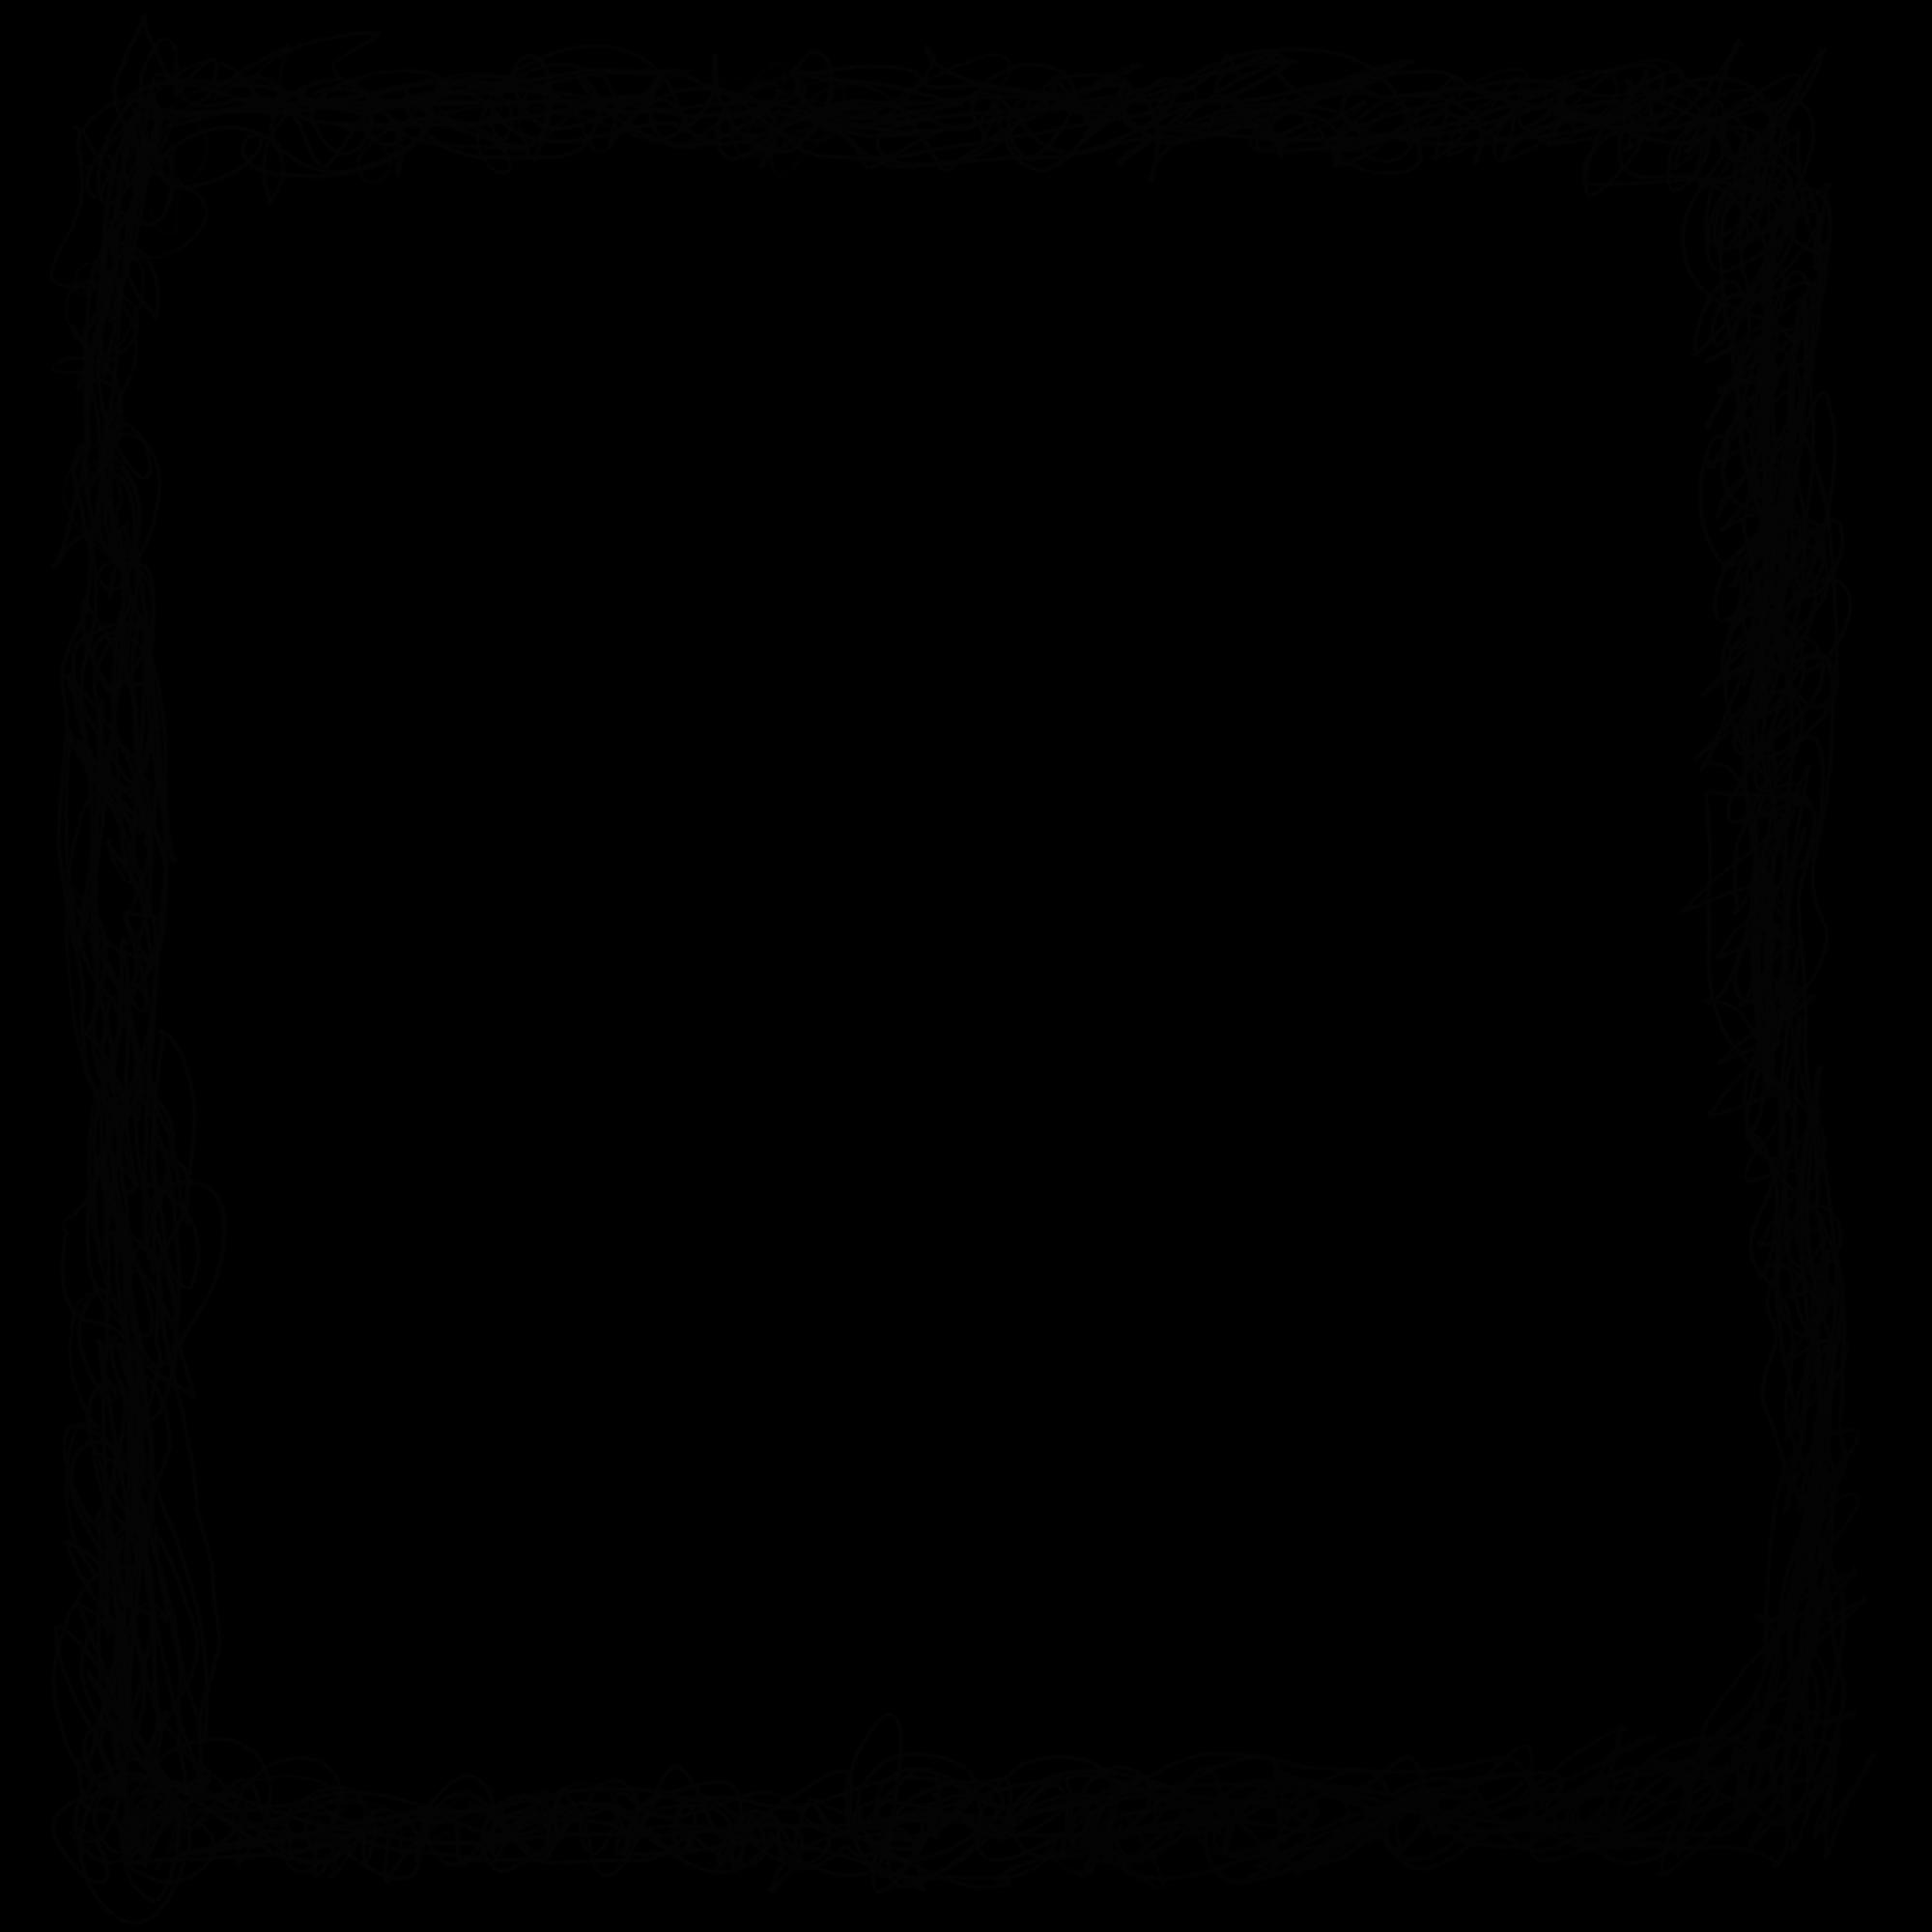 4 Square Scribble Frame Png Transparent Onlygfx Com